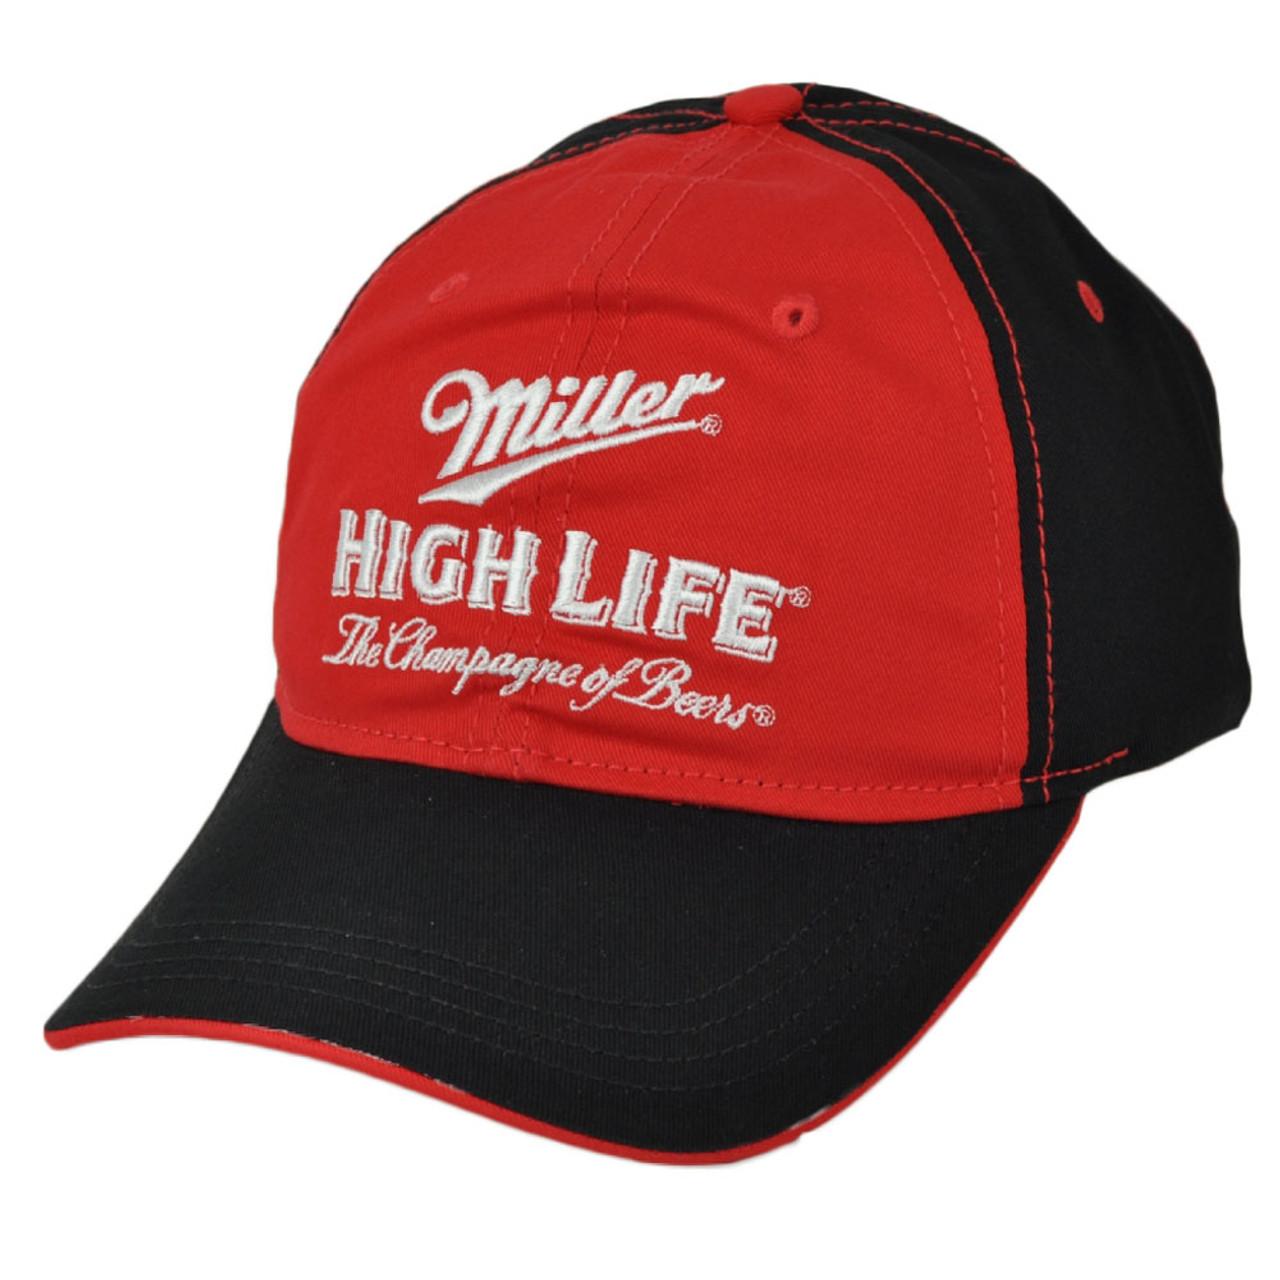 0910585ff Miller High Life Champagne of Beers Red Black Hat Cap Curved Bill Adjustable